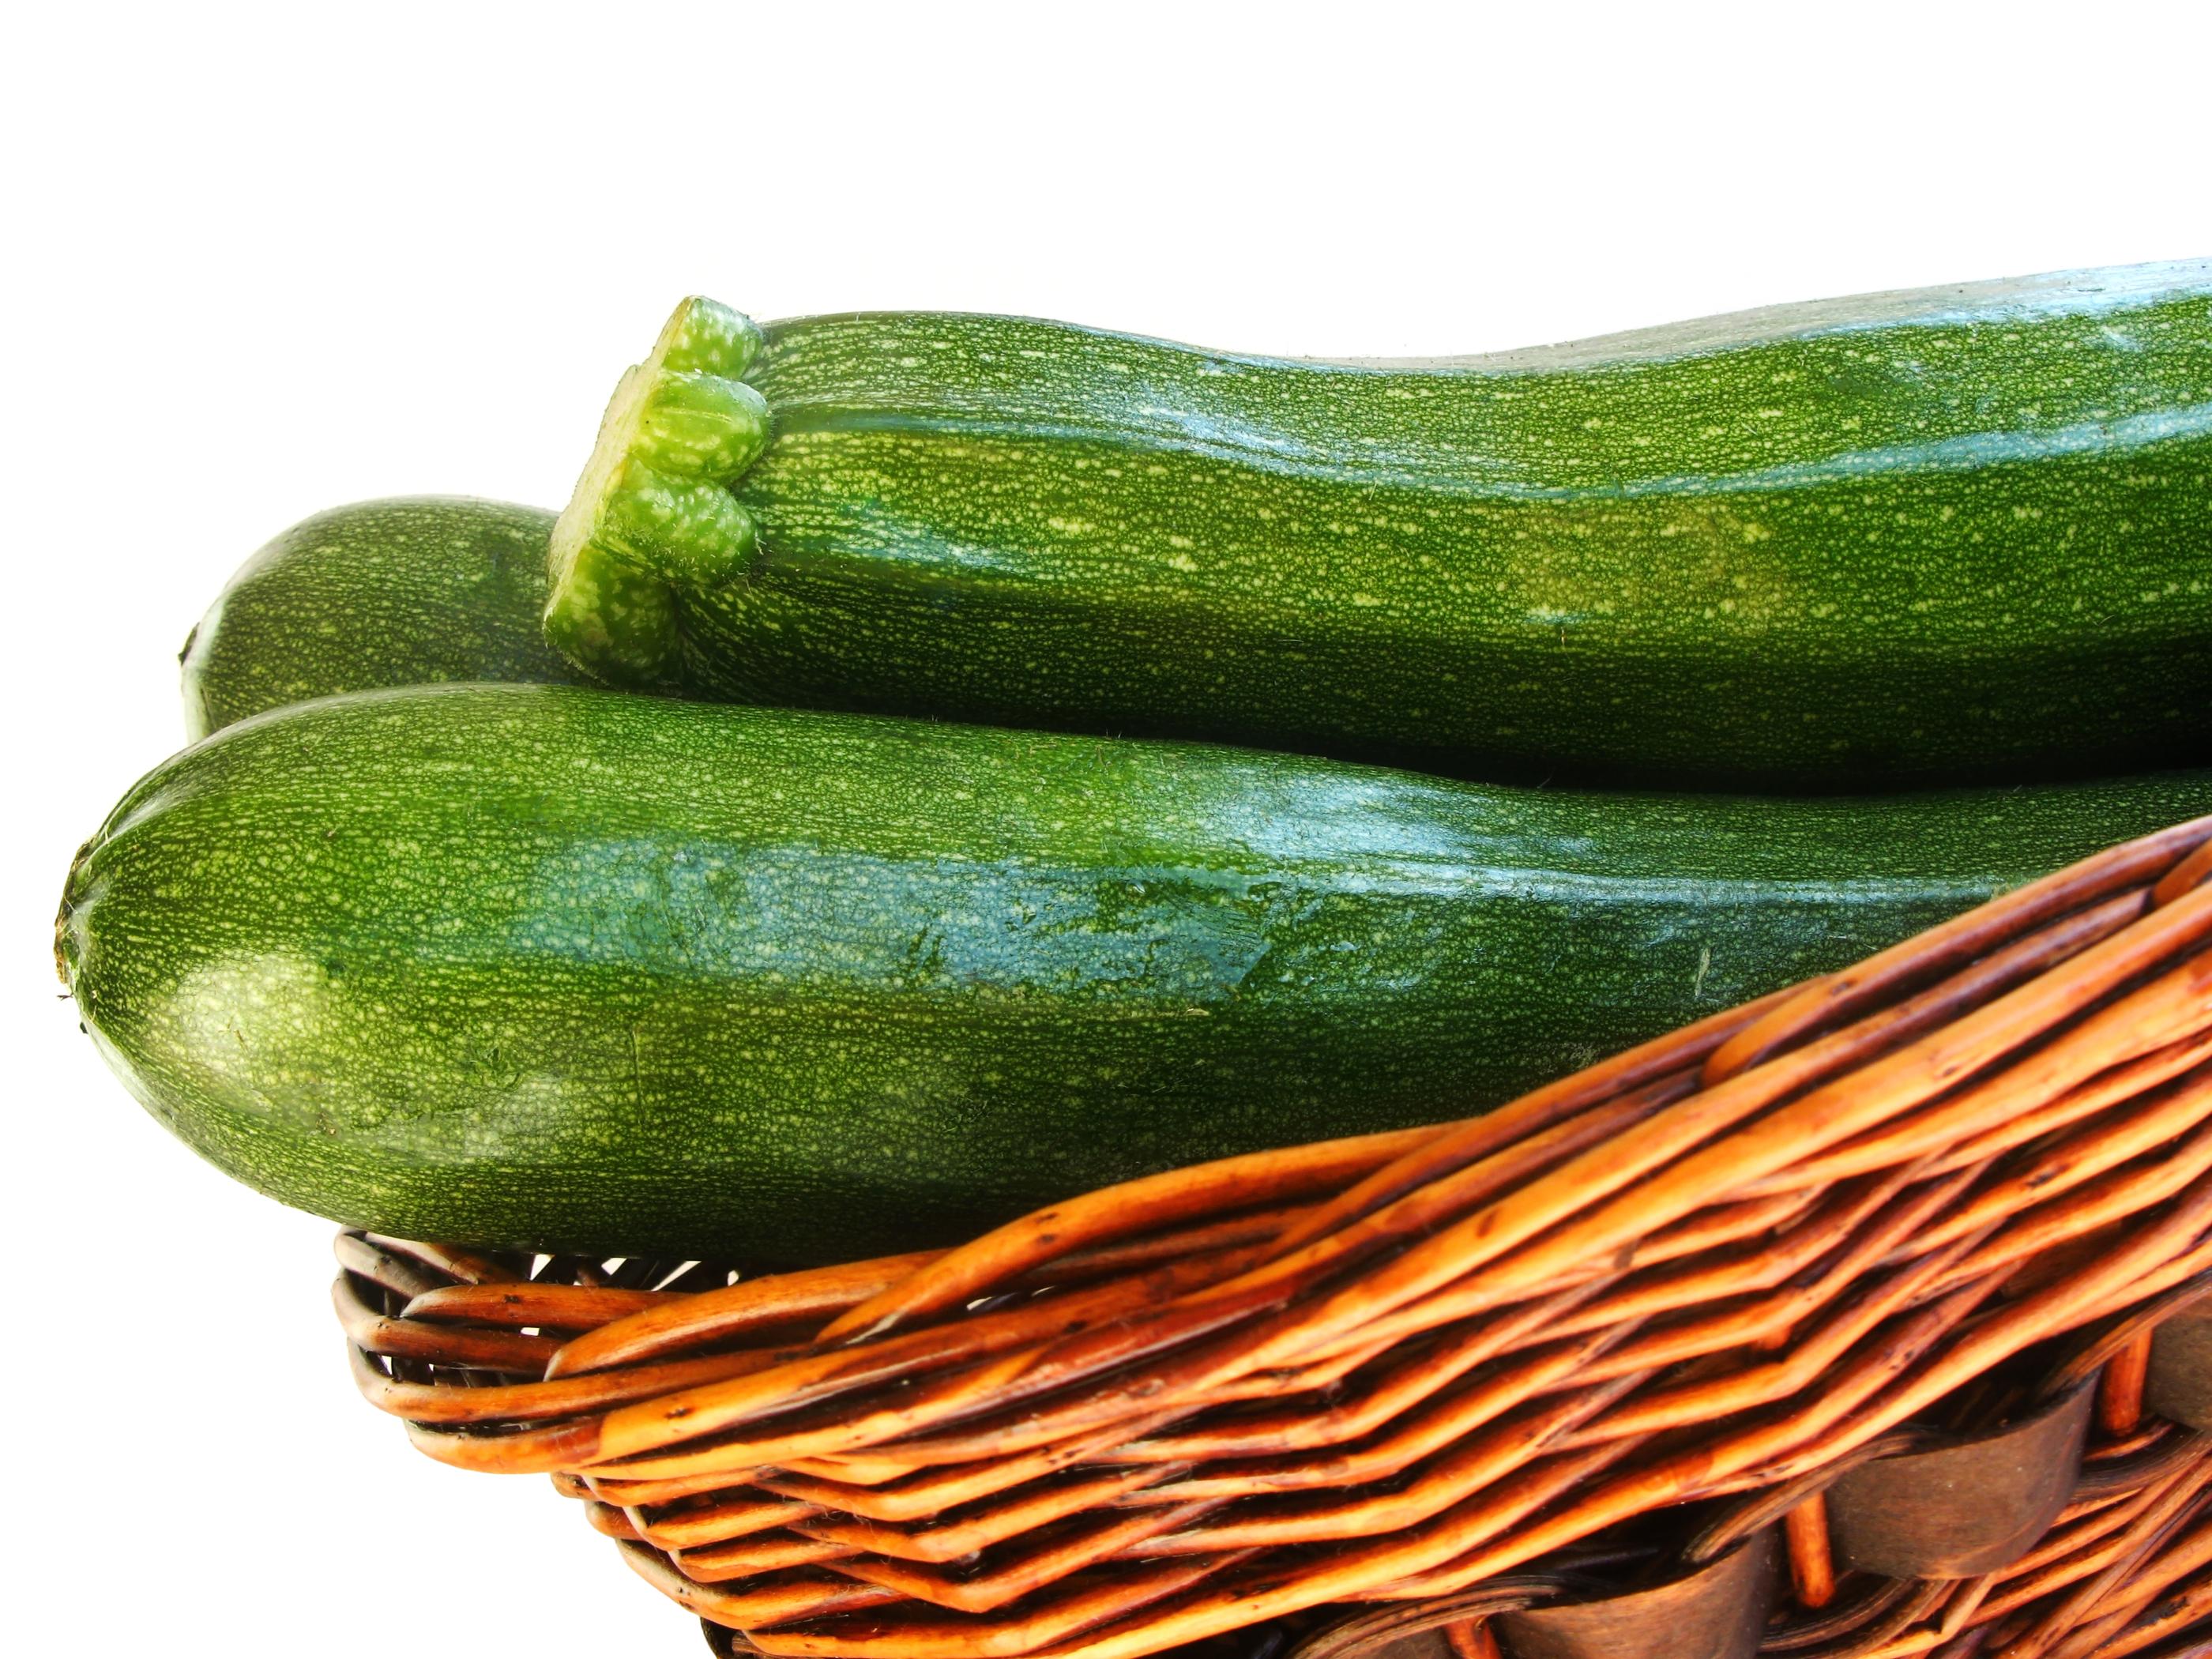 Ricette Verdure Nascoste.Ricette Con Le Verdure Nascoste Pasta Al Pesto Con Zucchine Babygreen